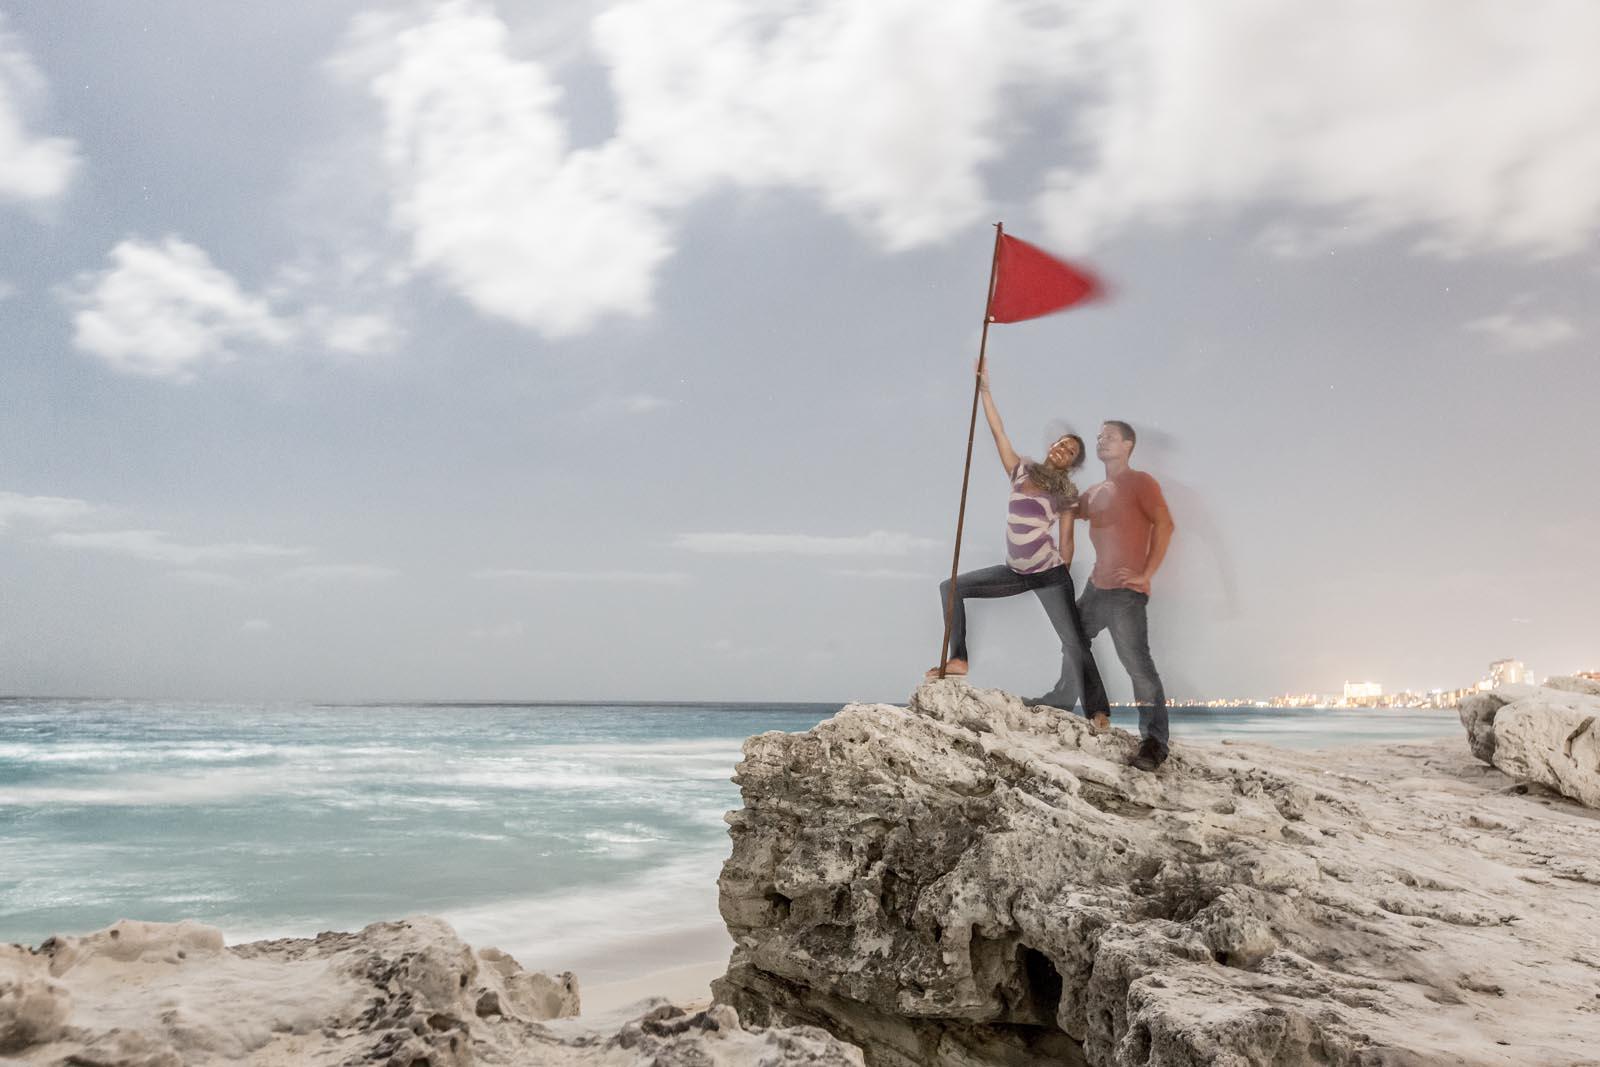 We conquered Cancun!